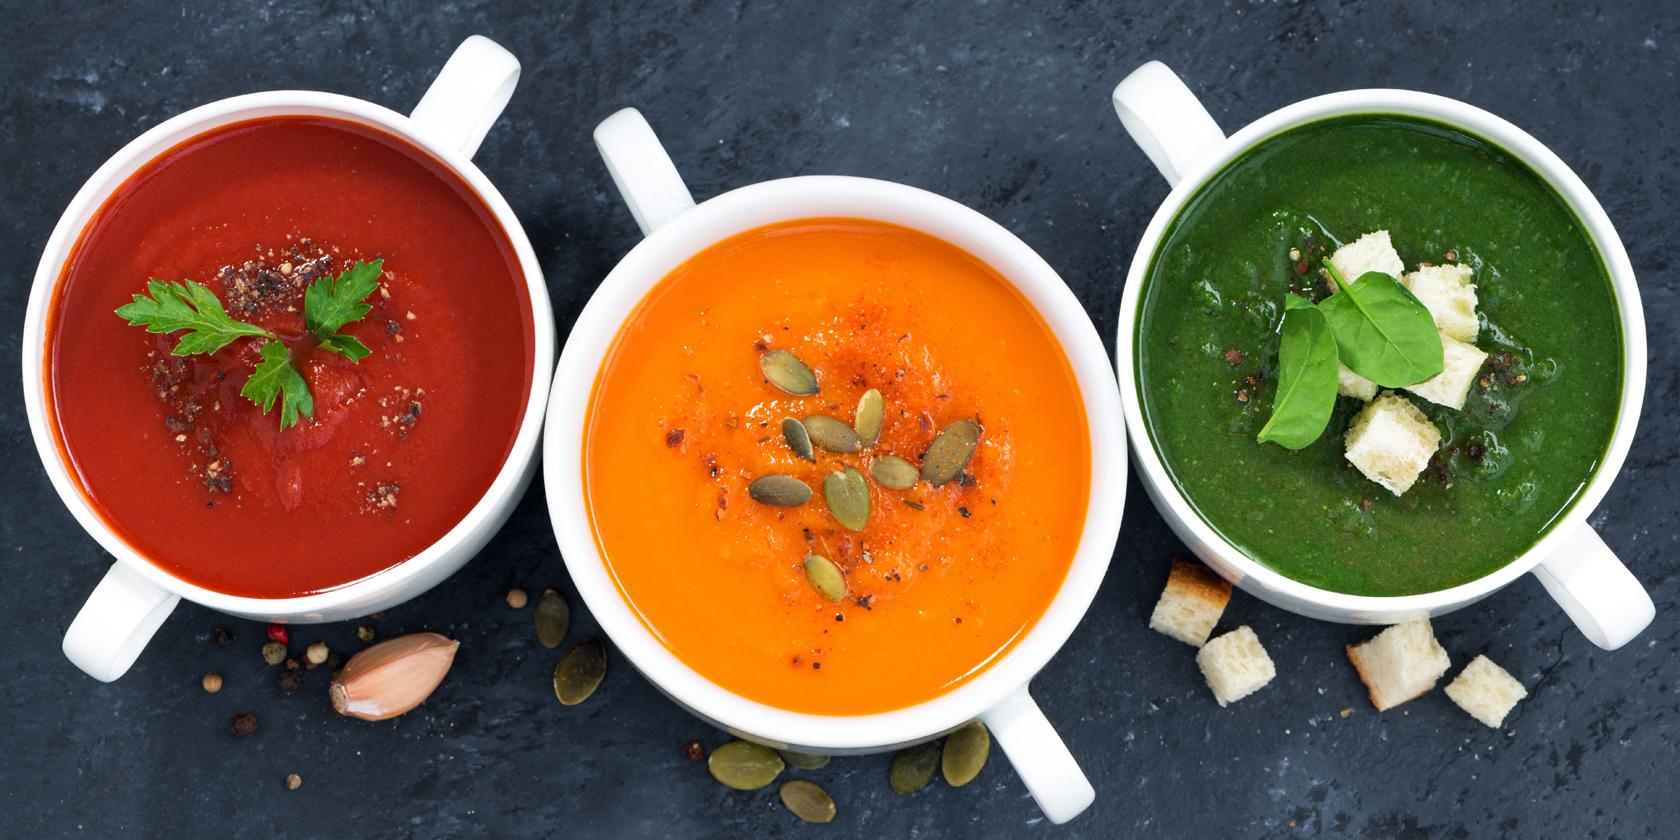 Souping: Suppen sind die neuen Detox-Kuren